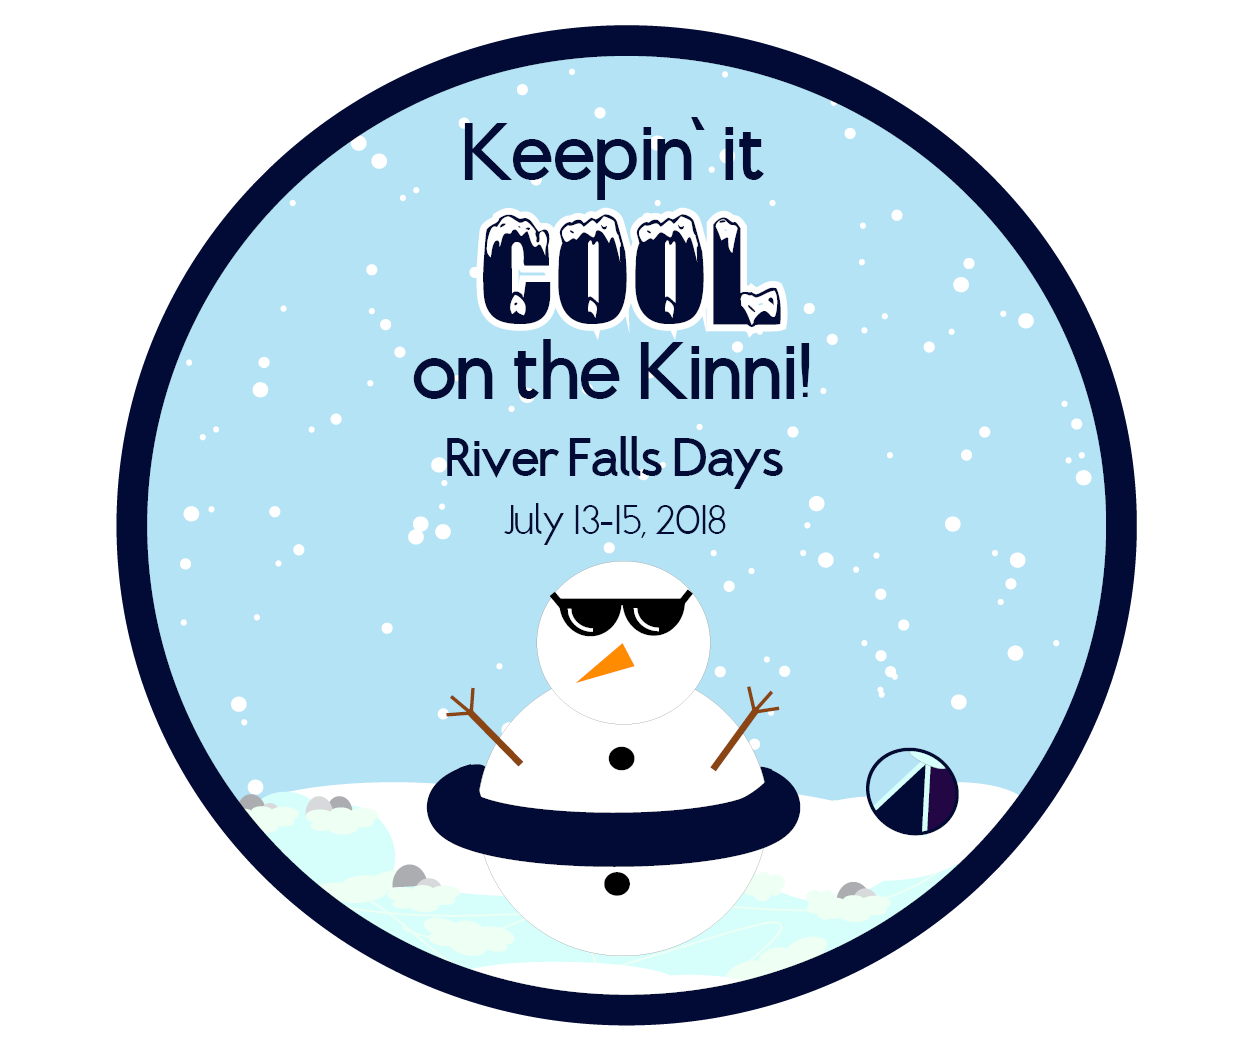 2018 River Falls Days